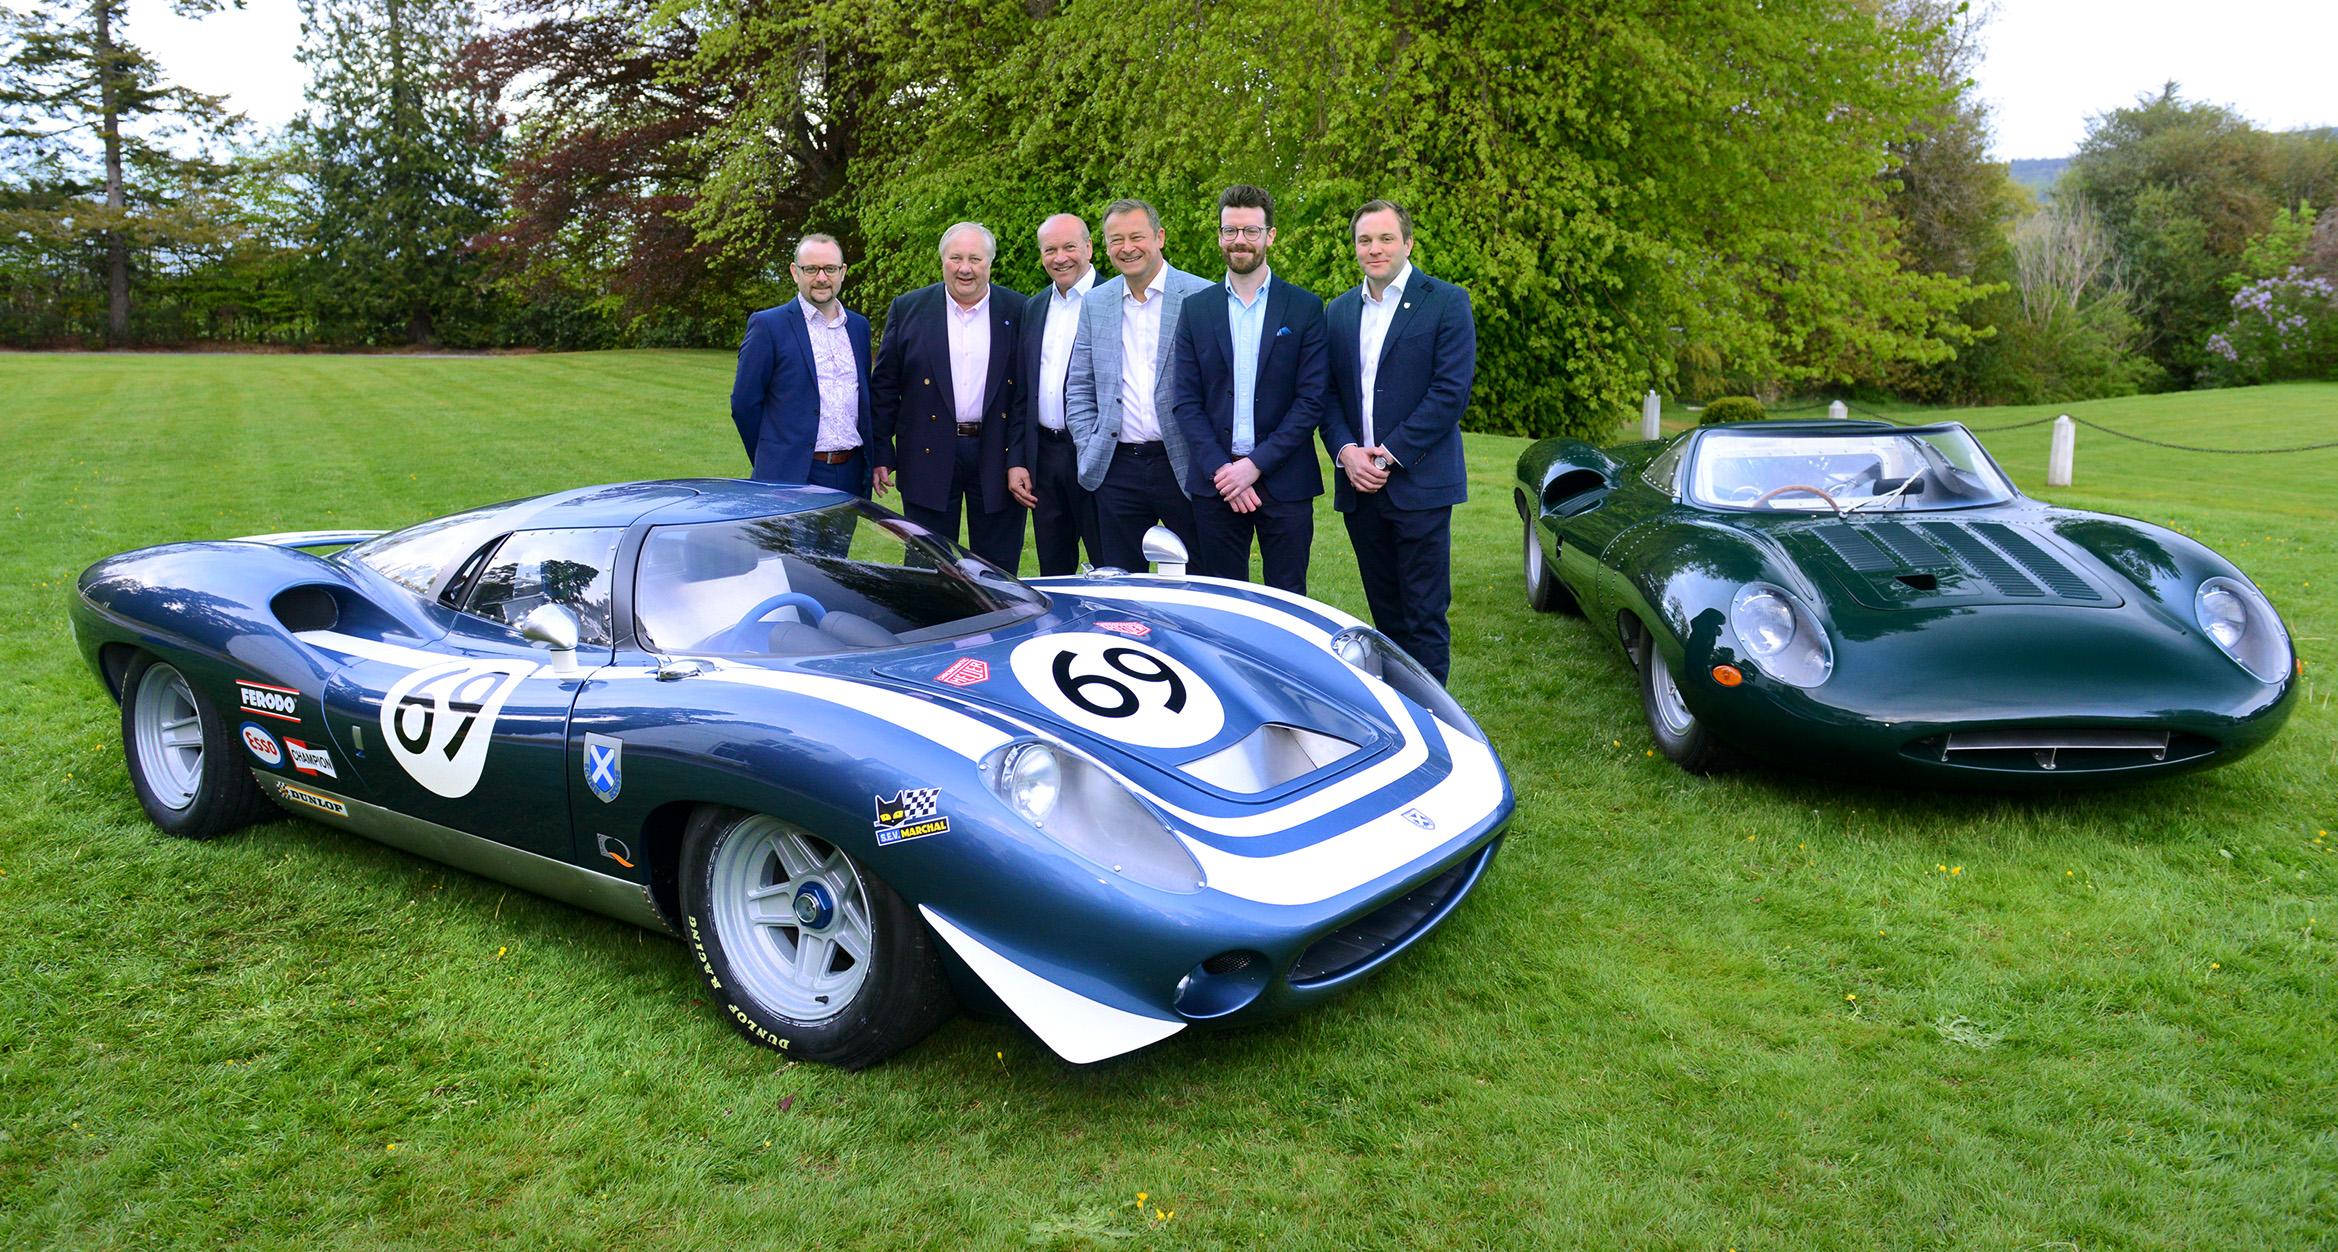 Left to Right: James Philpotts (Engineer-Design Q), Hugh McCaig (Ecurie Ecosse), Neville Swales (Building the Legend), Howard Guy (Design Q CEO), Patrick McCallion (Exterior Designer-Design Q), Alasdair McCaig (Ecurie Ecosse) with the Ecurie Ecosse LM69 and Jaguar XJ13